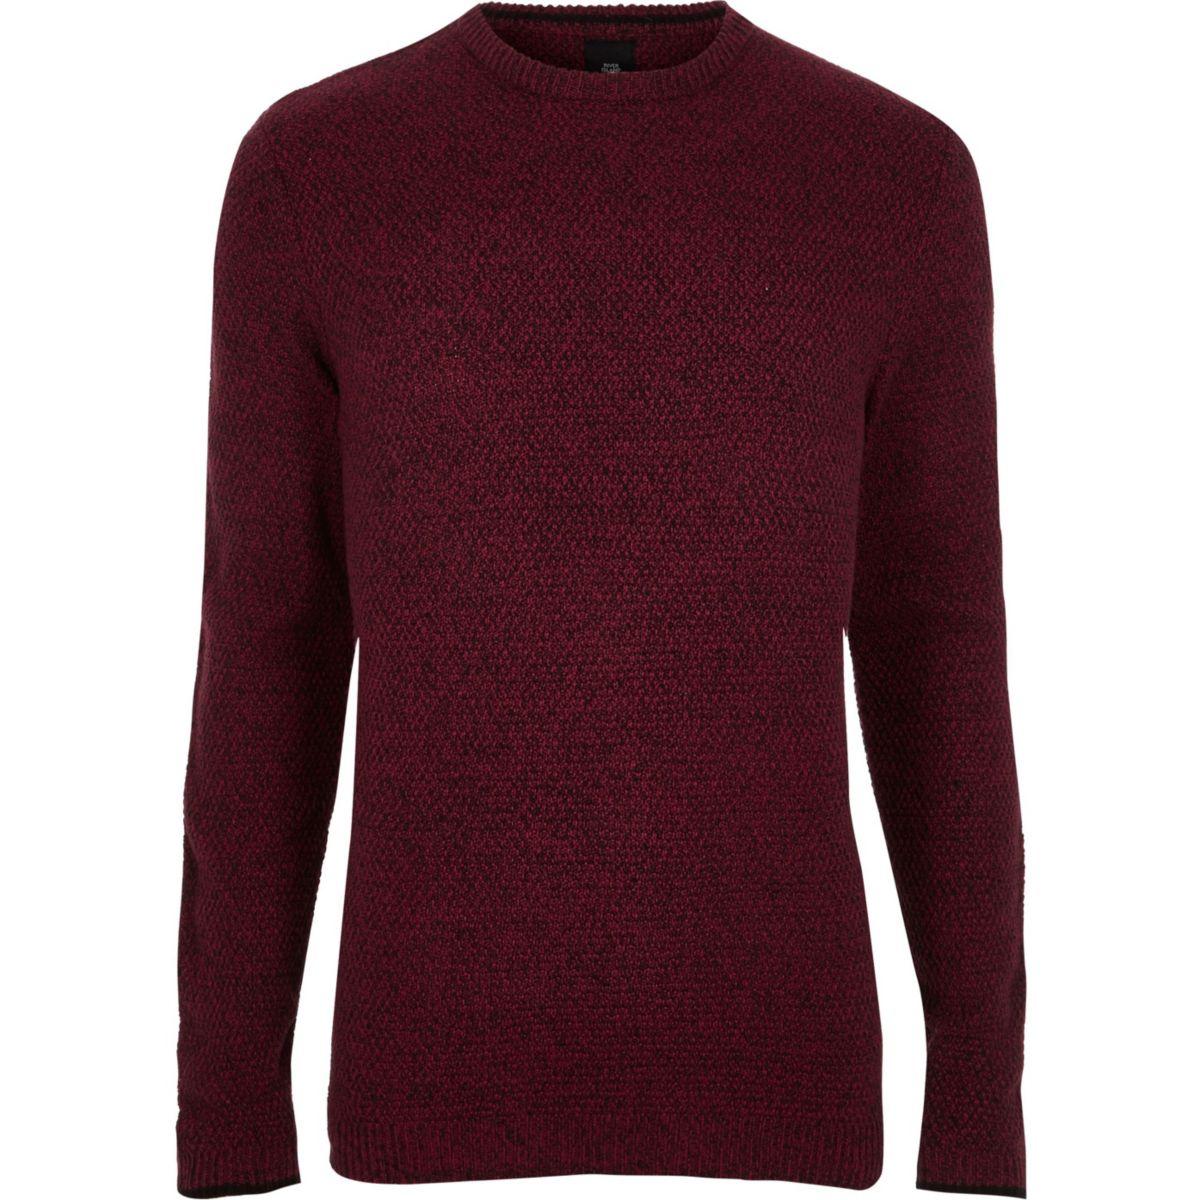 Big & Tall – Roter Pullover mit Rundhalsausschnitt